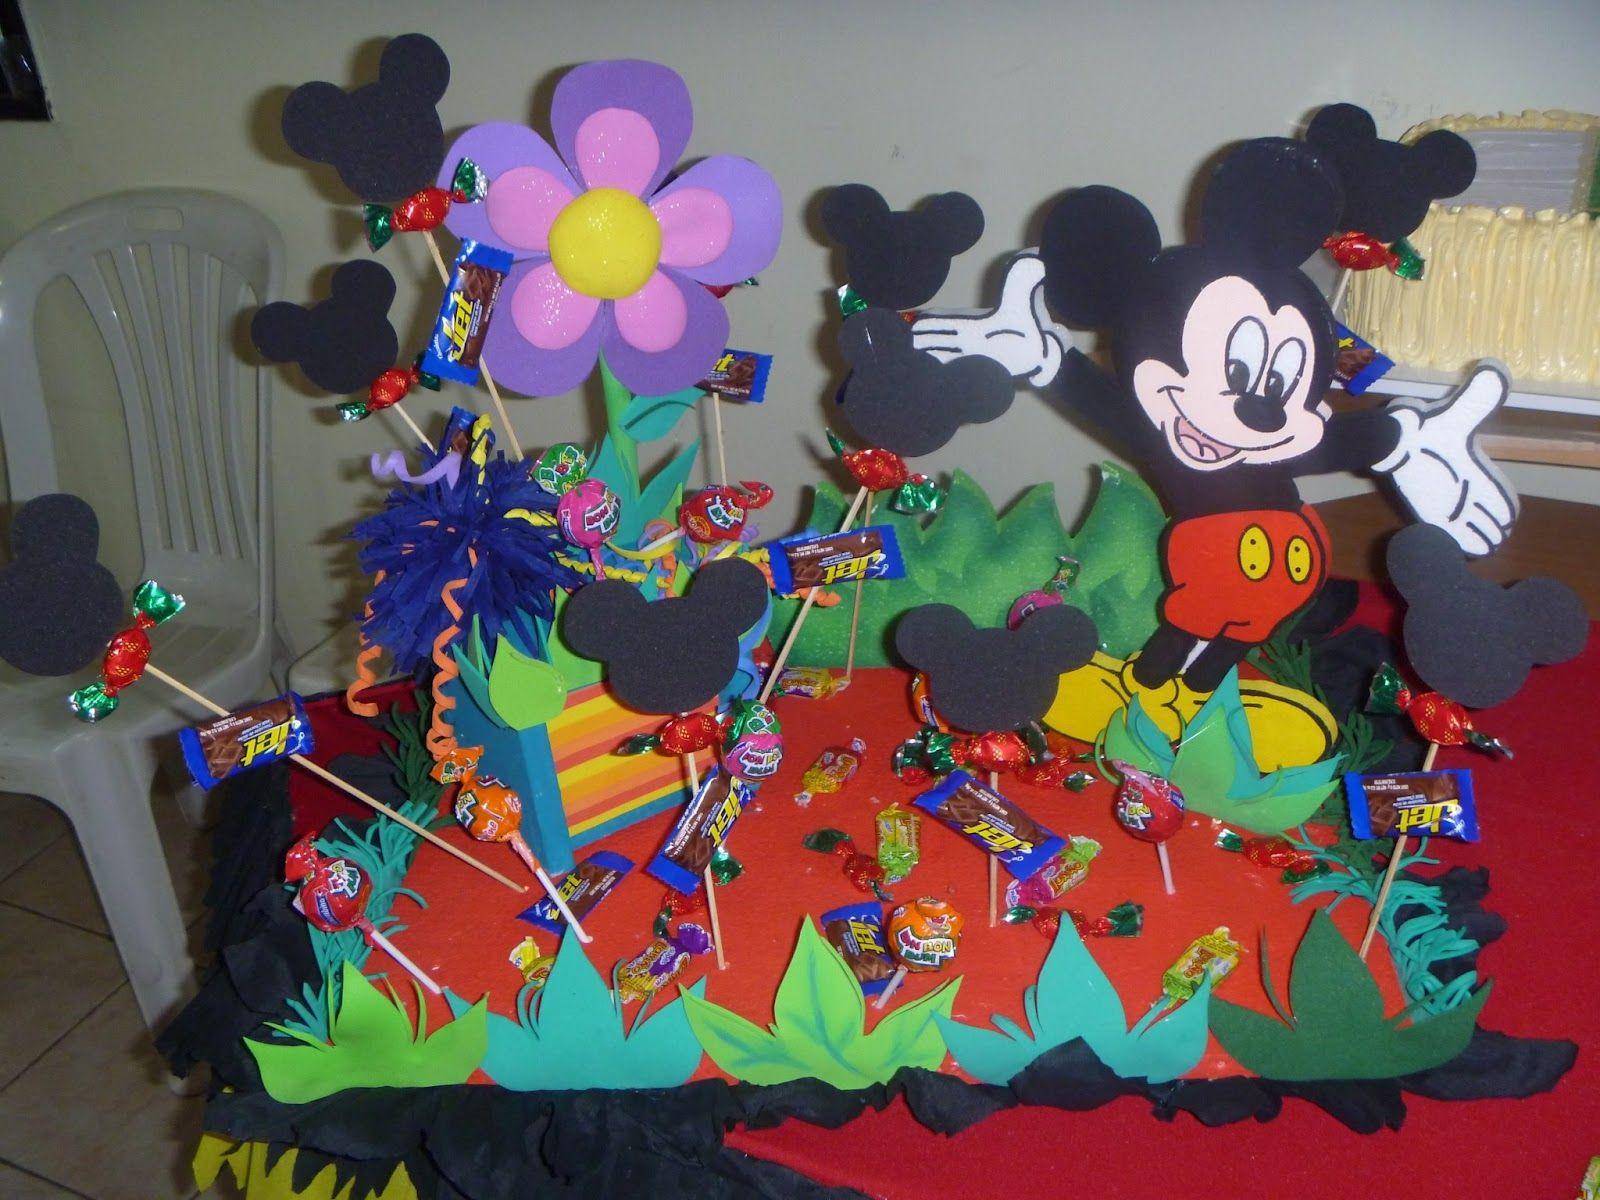 Decoracion de cumplea os de minnie y mickey mouse - Decoracion minnie cumpleanos ...